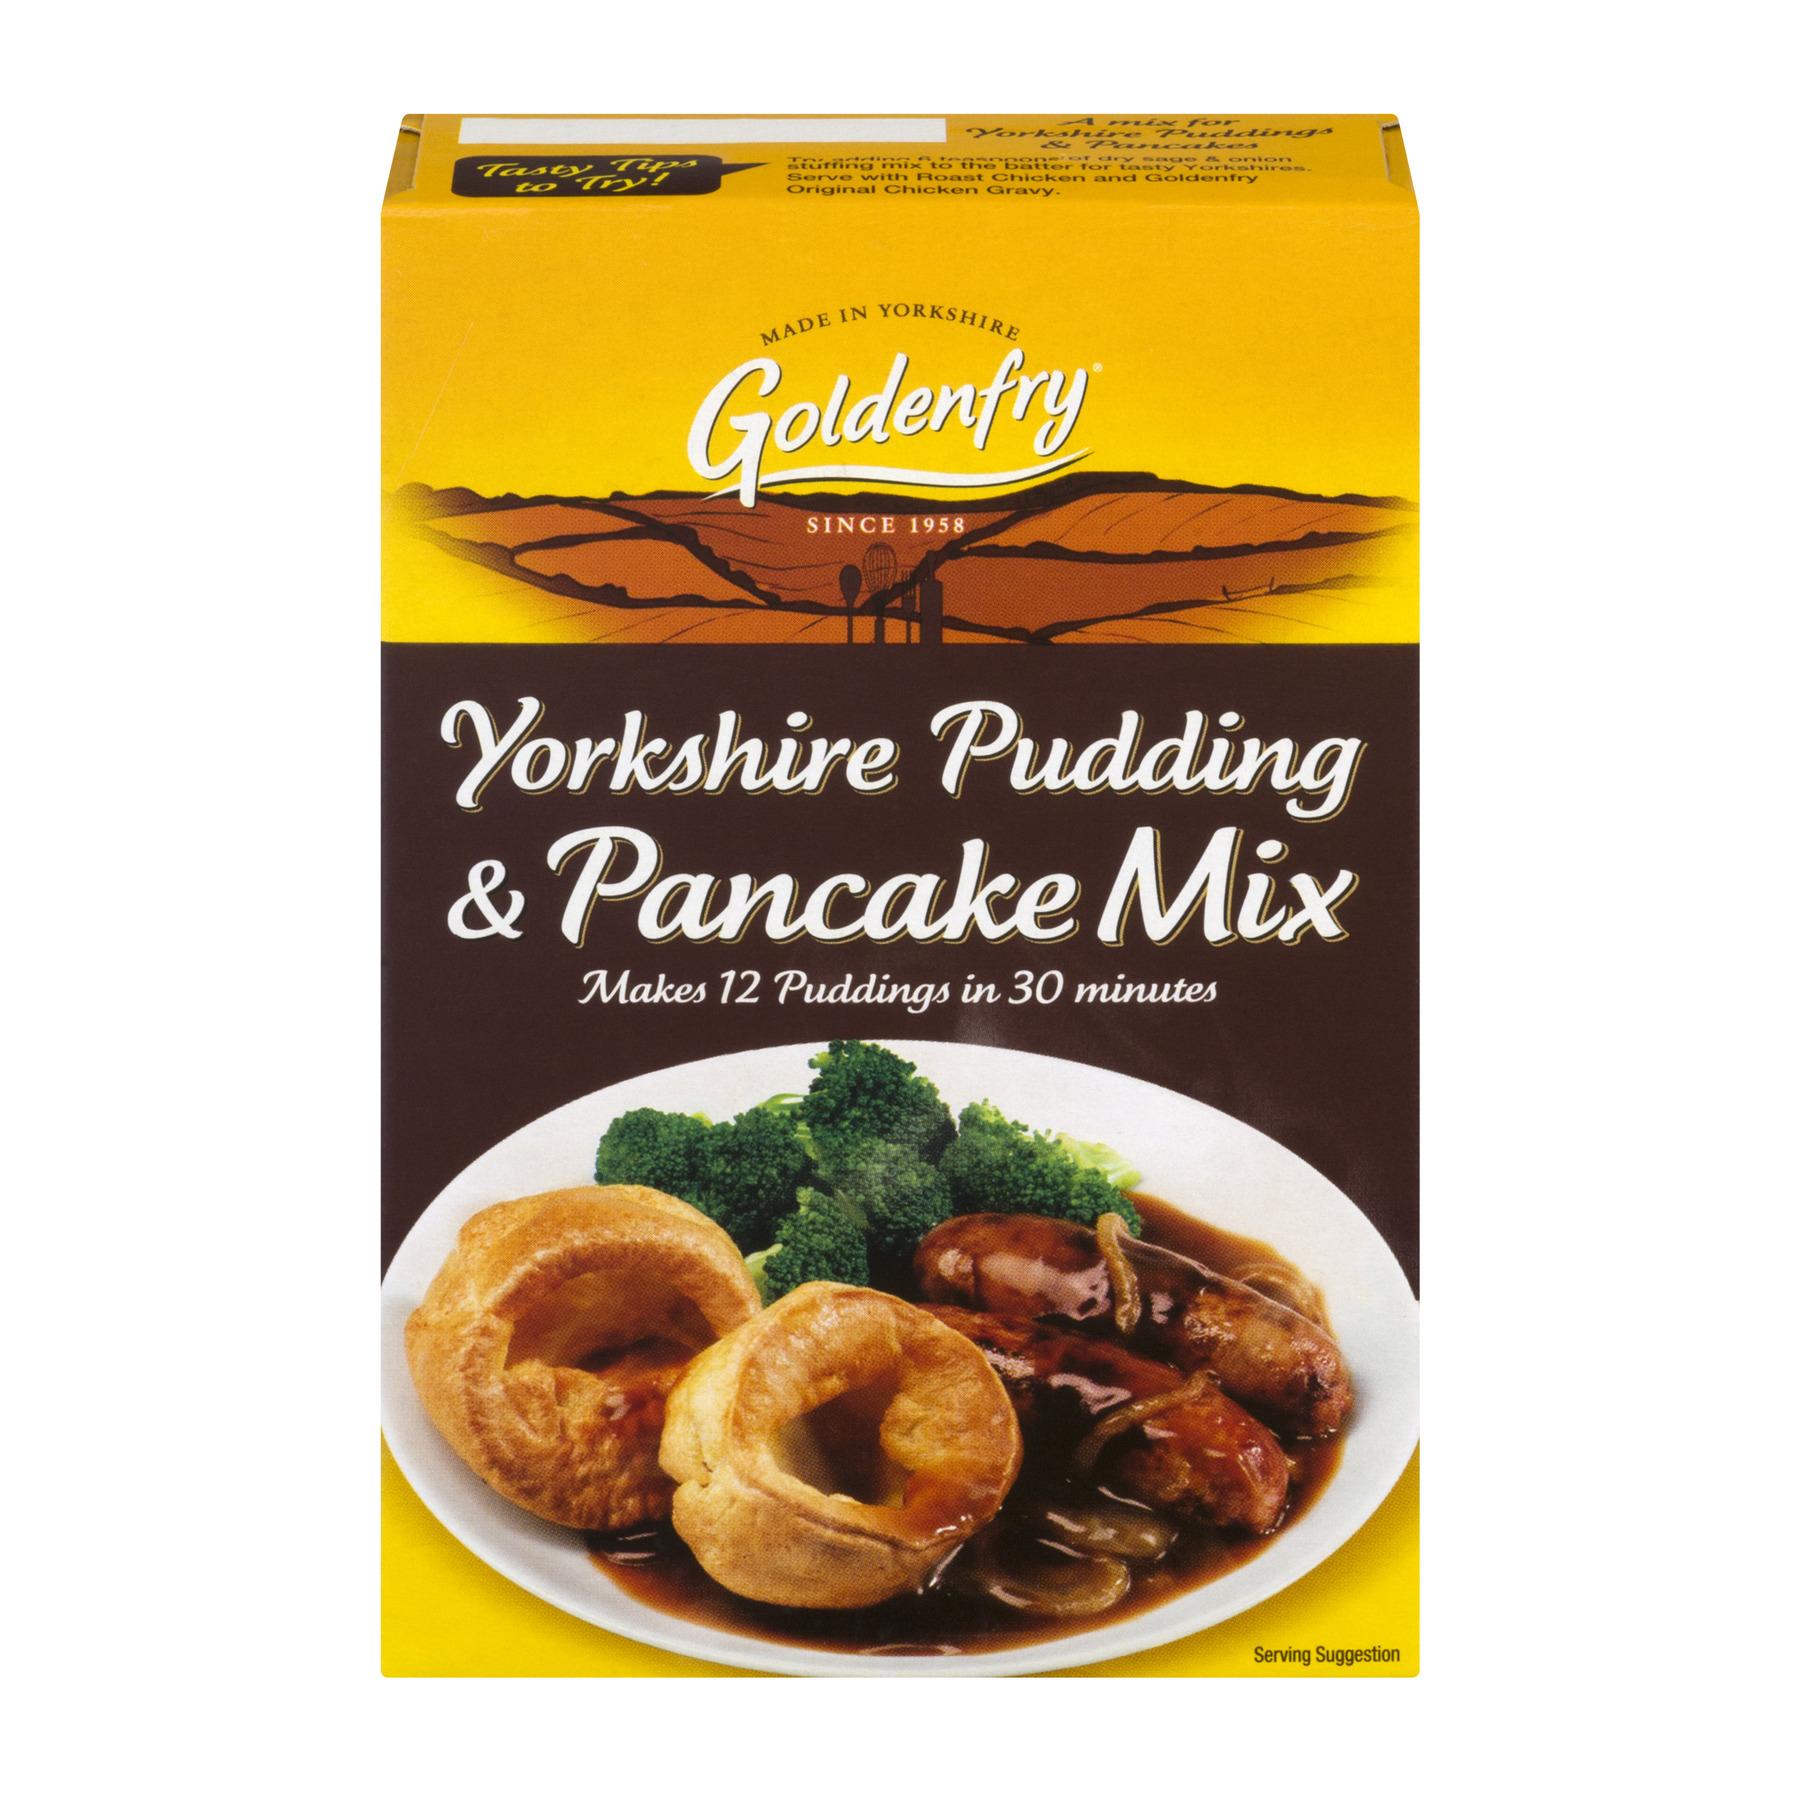 Goldenfry Yorkshire Pudding & Pancake Mix, 5.0 OZ